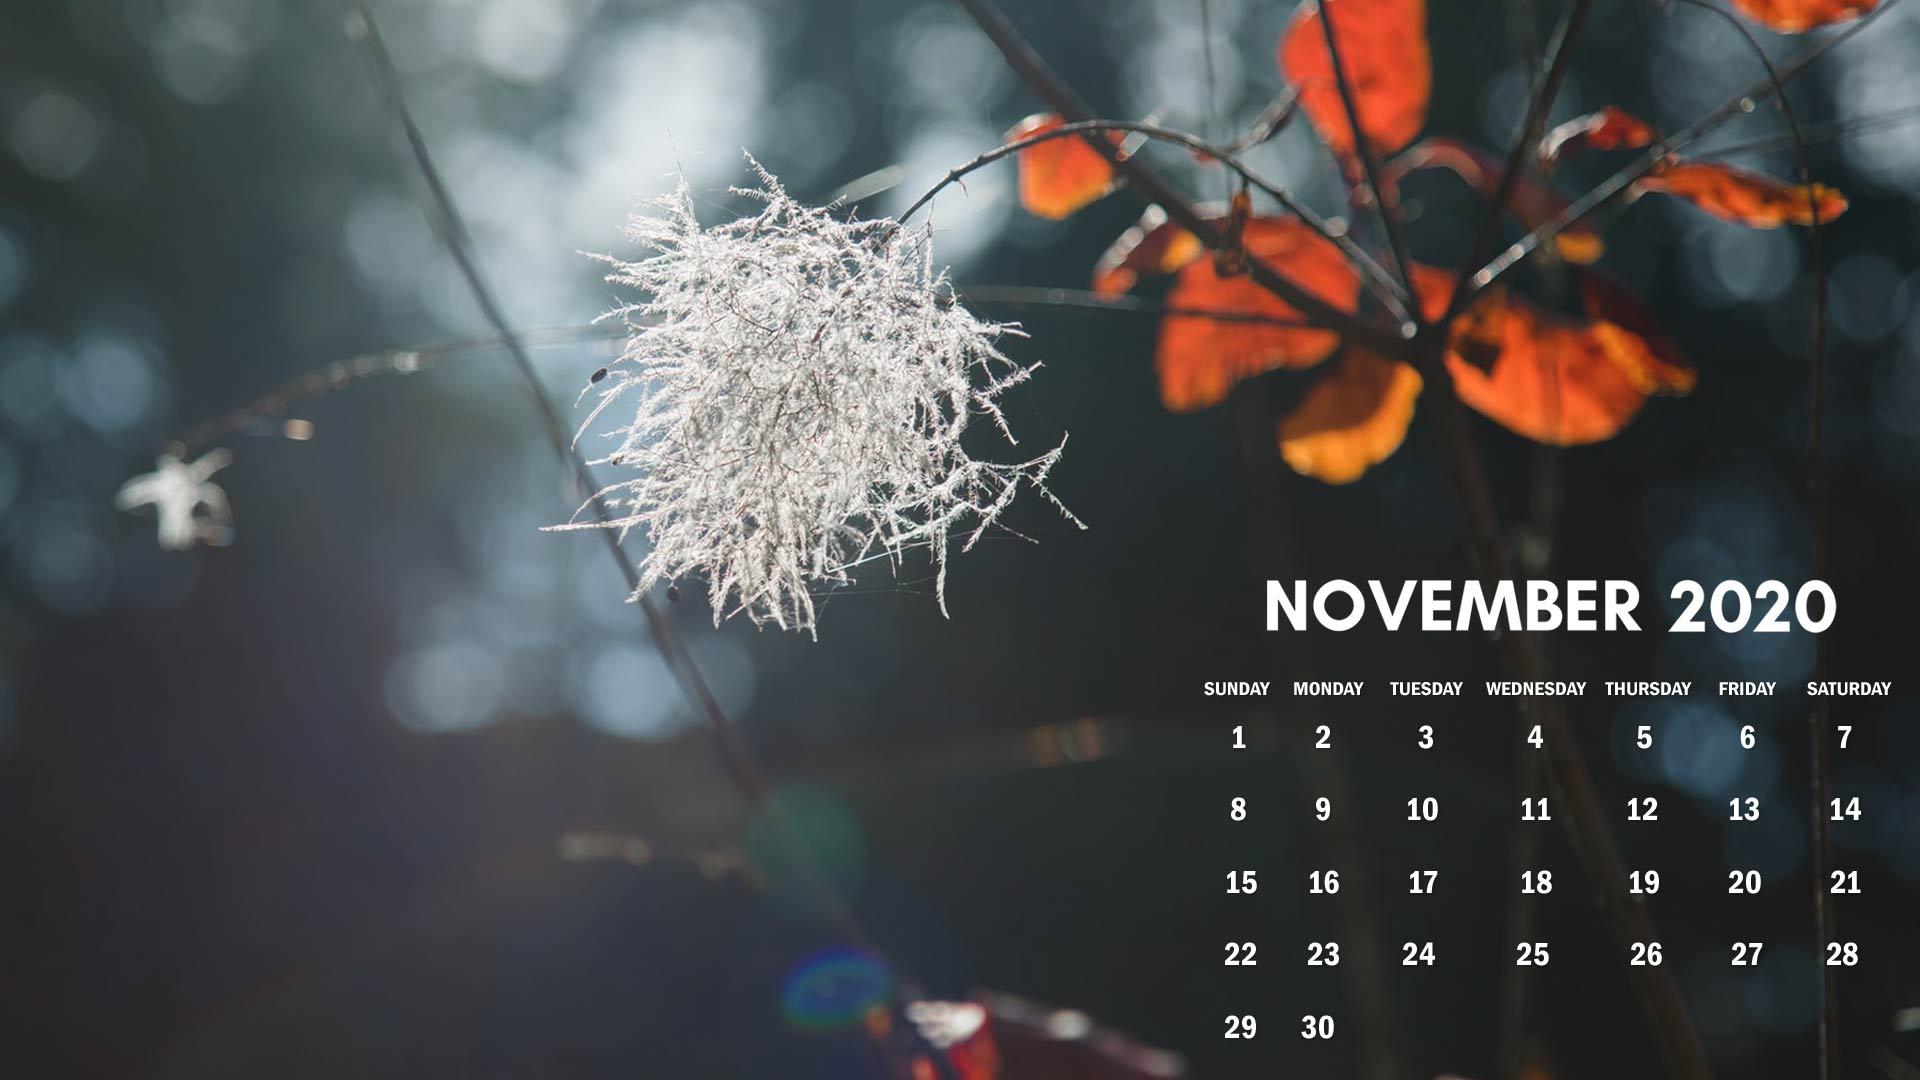 November 2020 Calendar Wallpaper For Desktop Computer Download